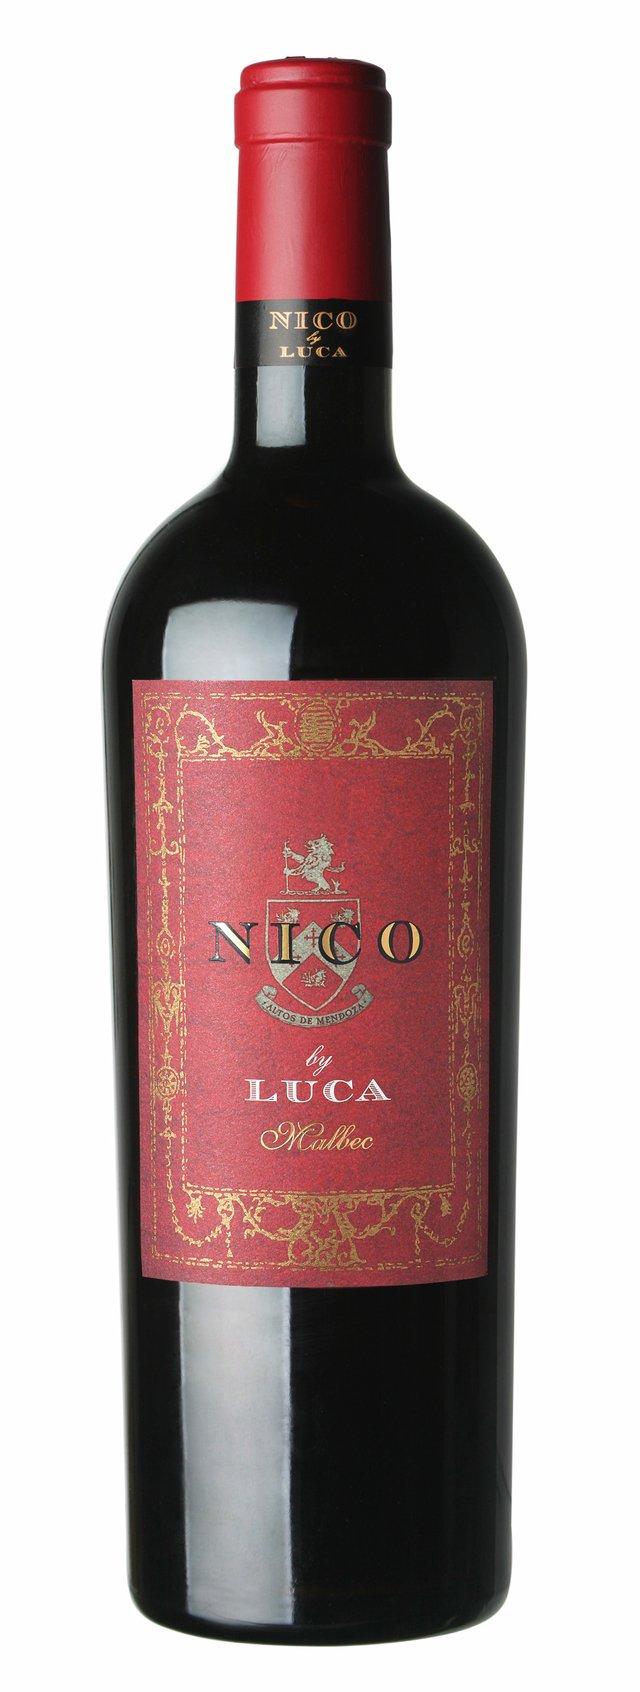 Nico By Luca x3 2012